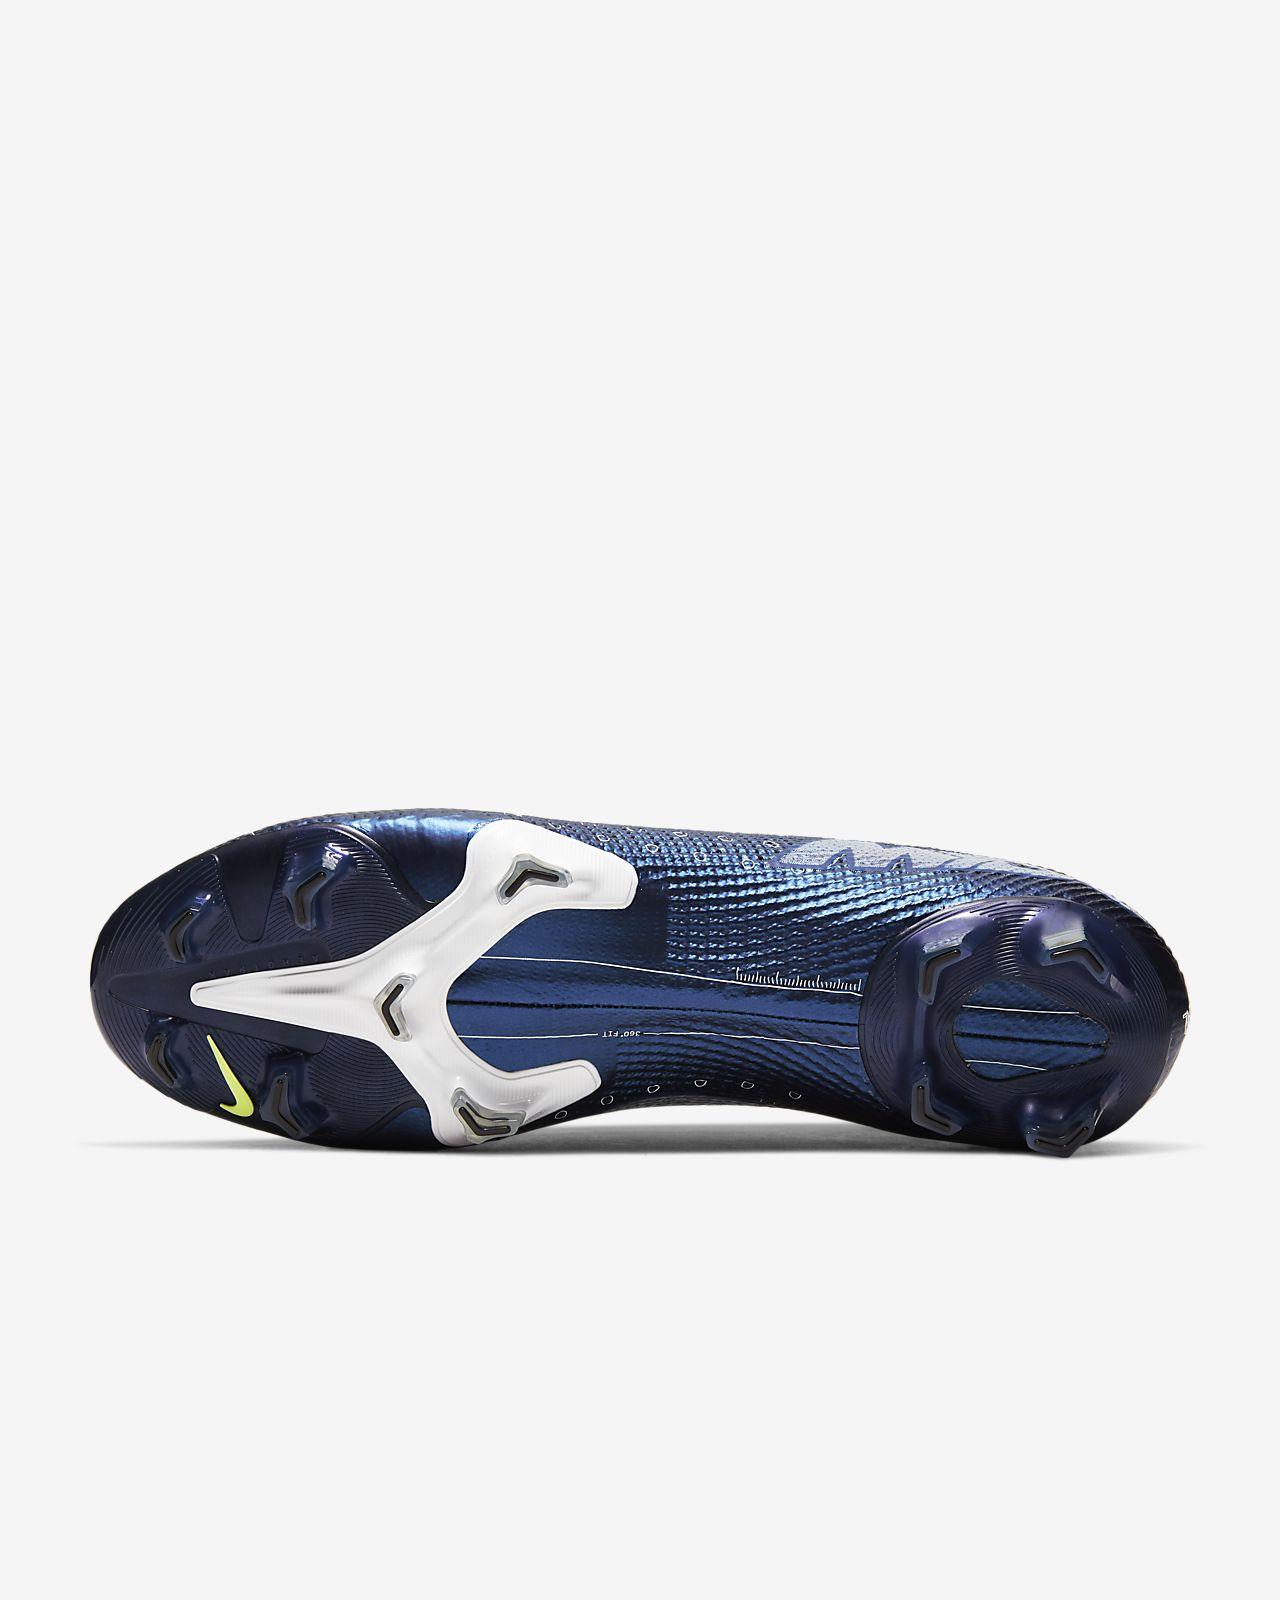 Scarpa da calcio per terreni duri Nike Mercurial Superfly 7 Elite MDS FG